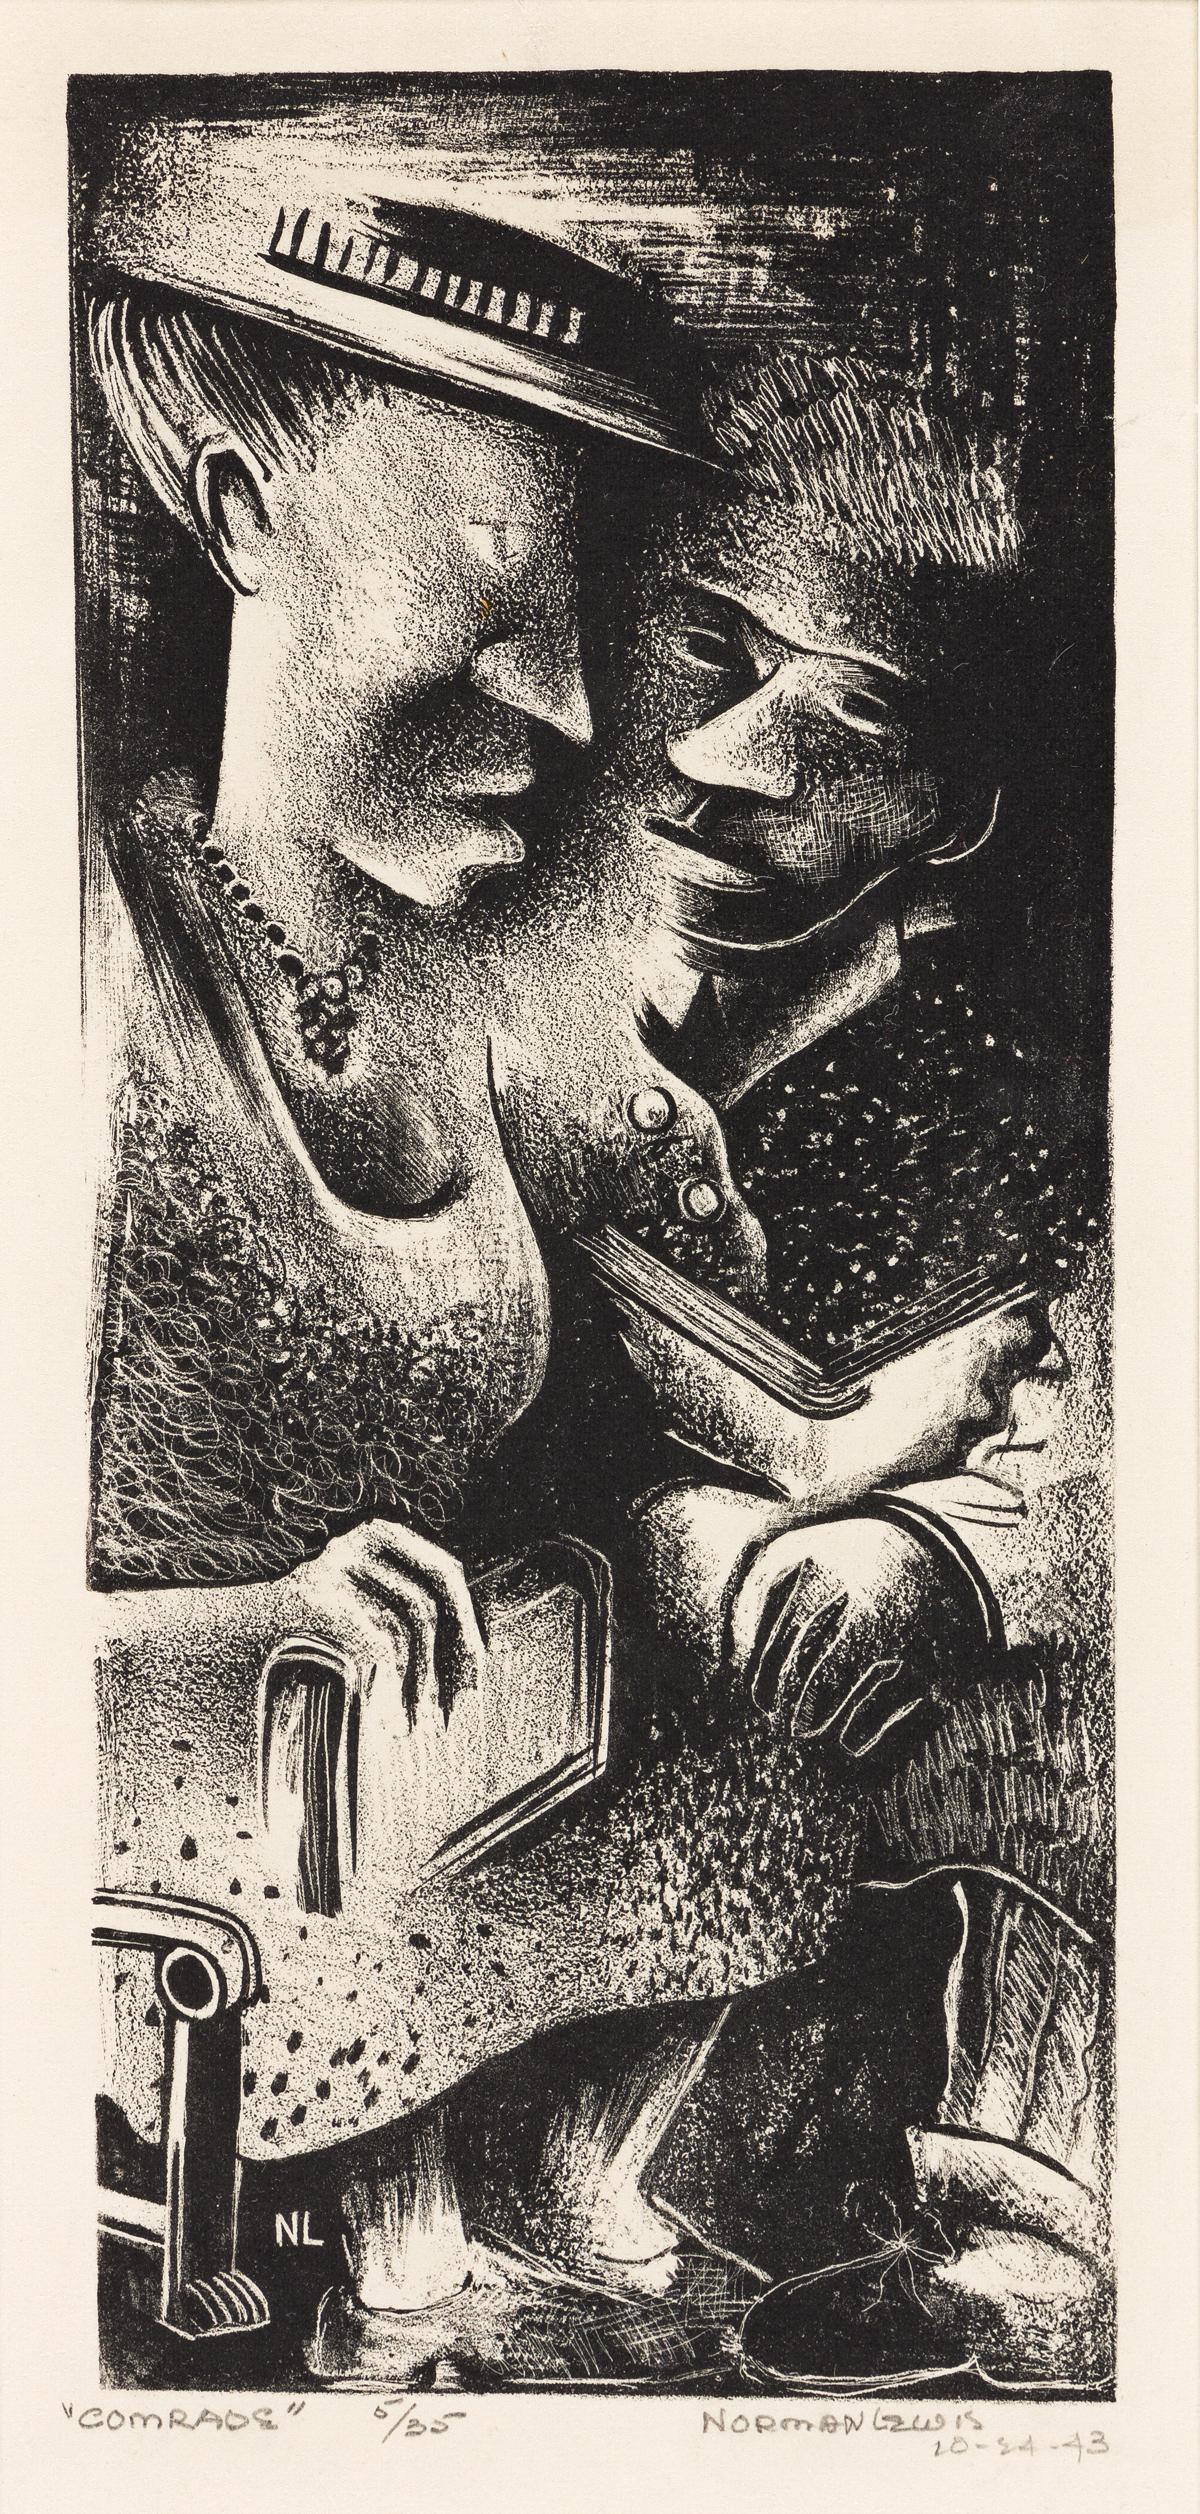 NORMAN LEWIS (1909-1979)  Comrades.